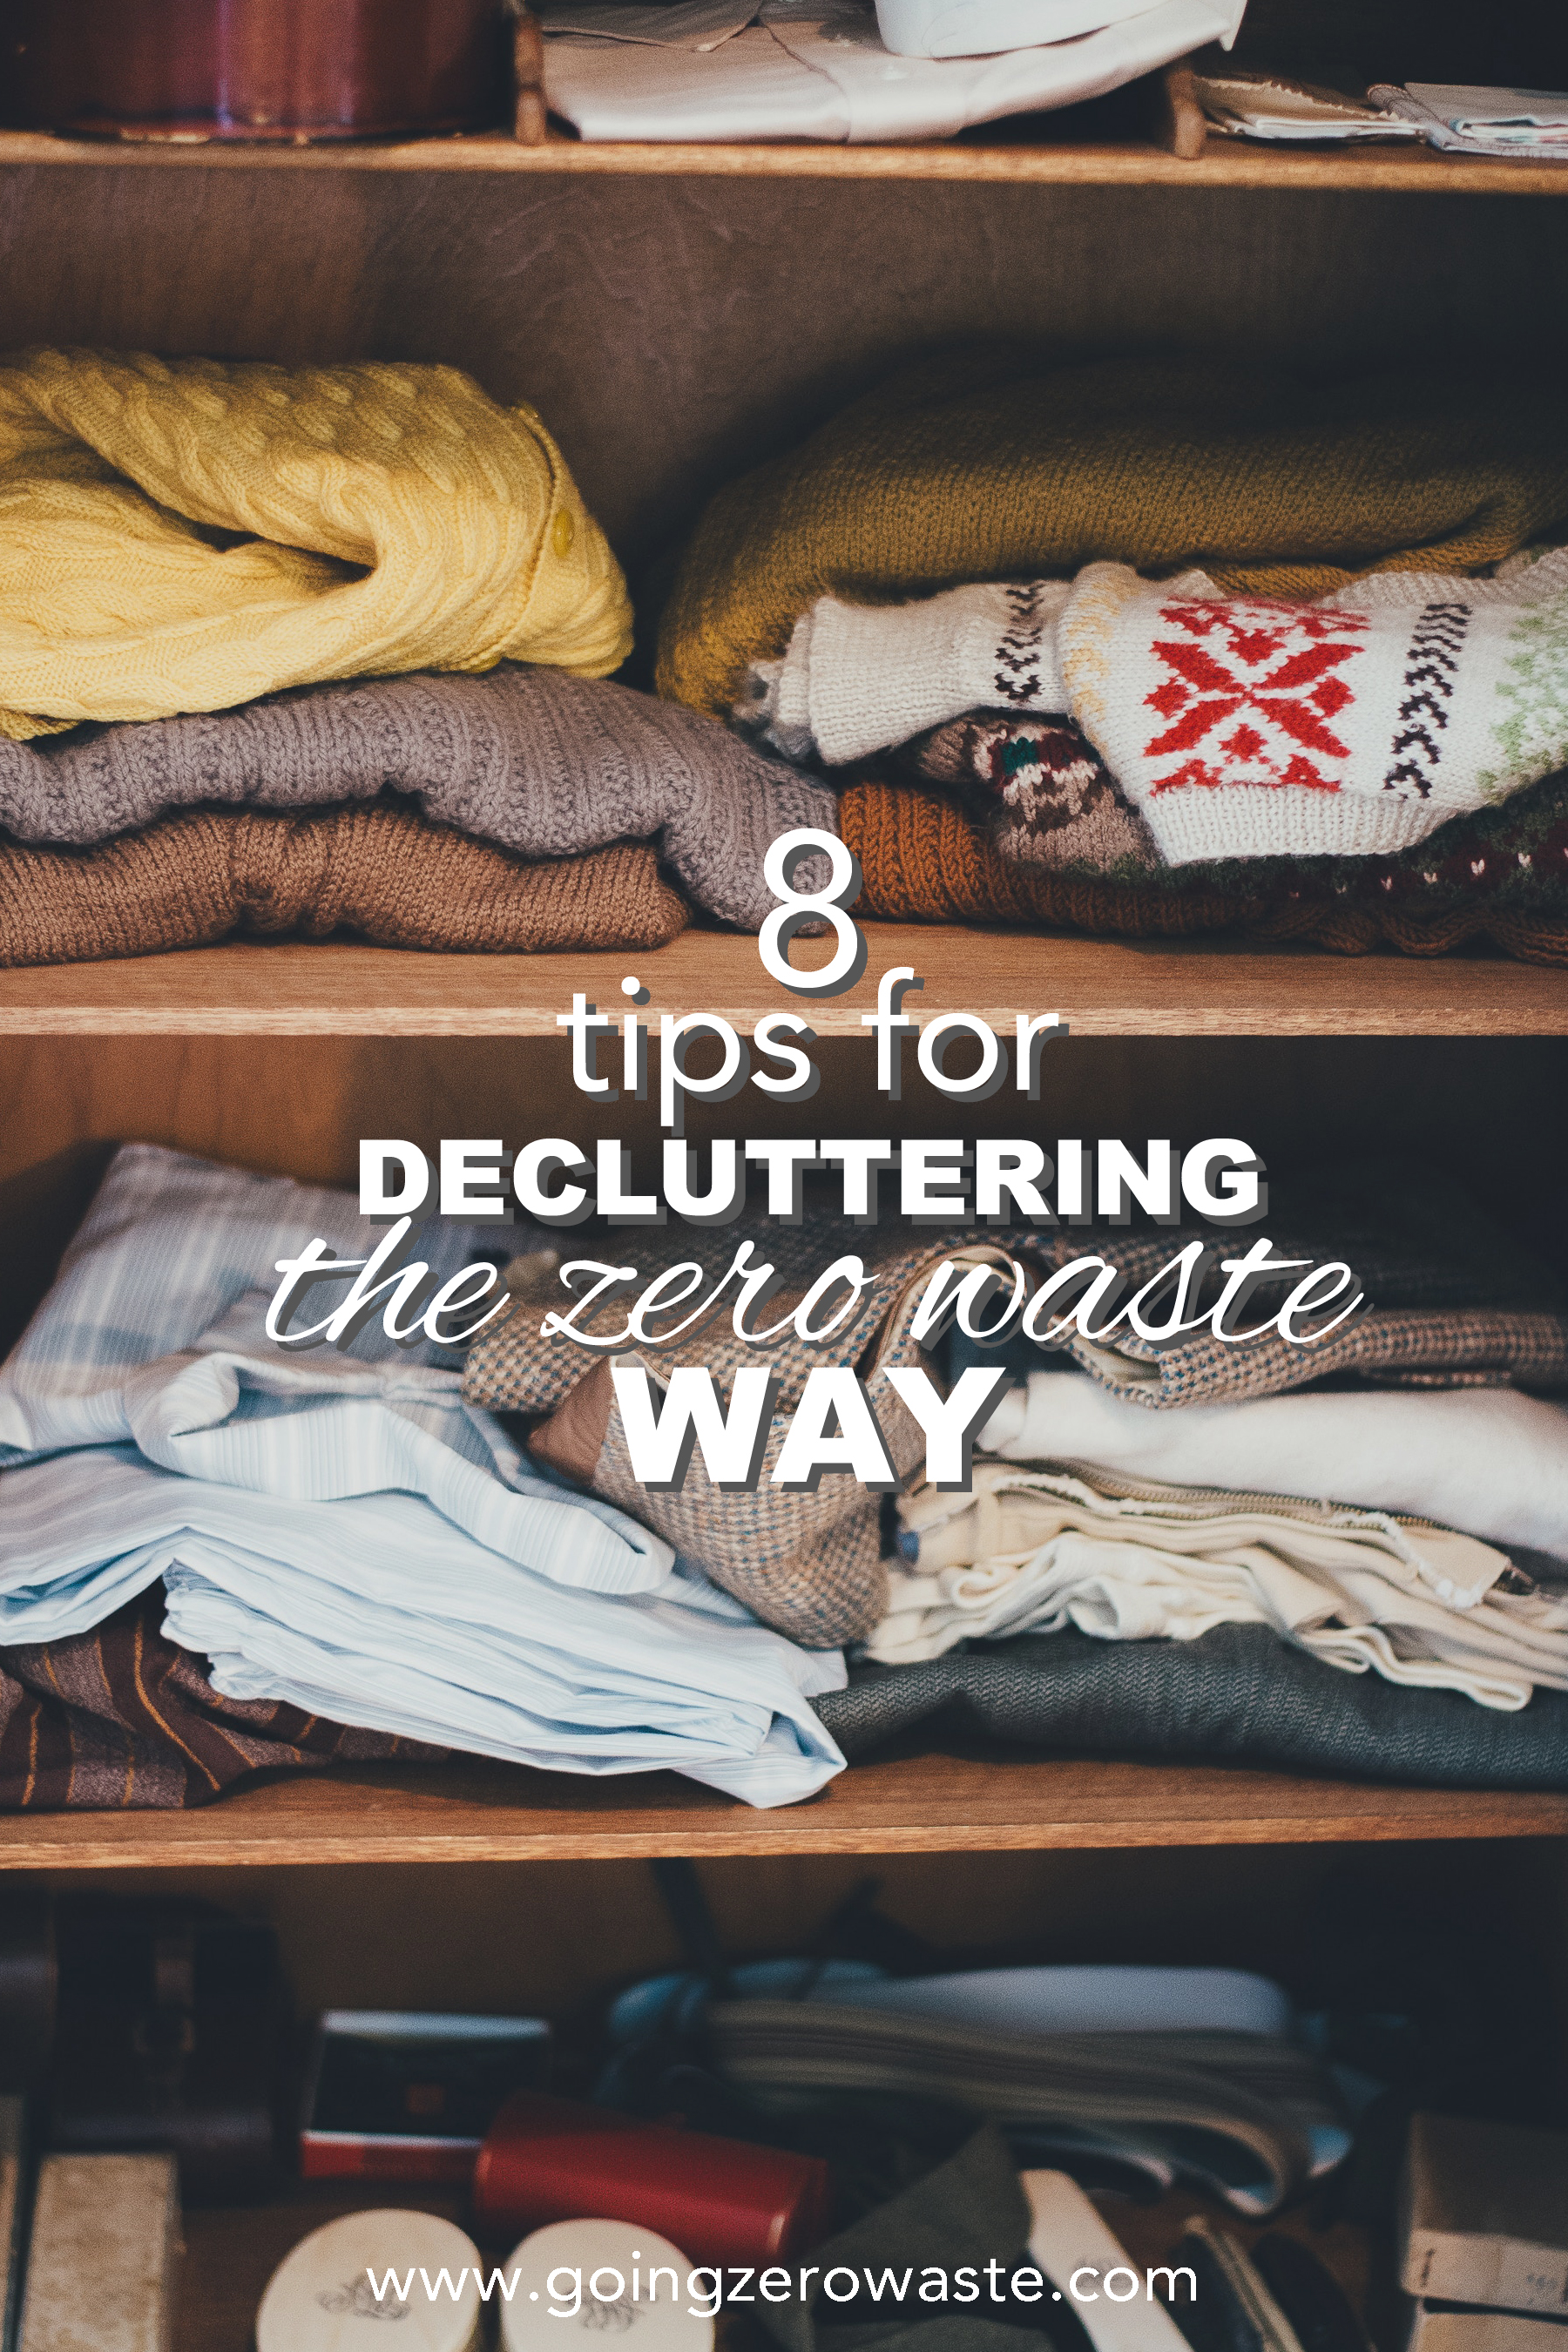 8 tips for decluttering the zero waste way from www.goingzerowaste.com #zerowaste